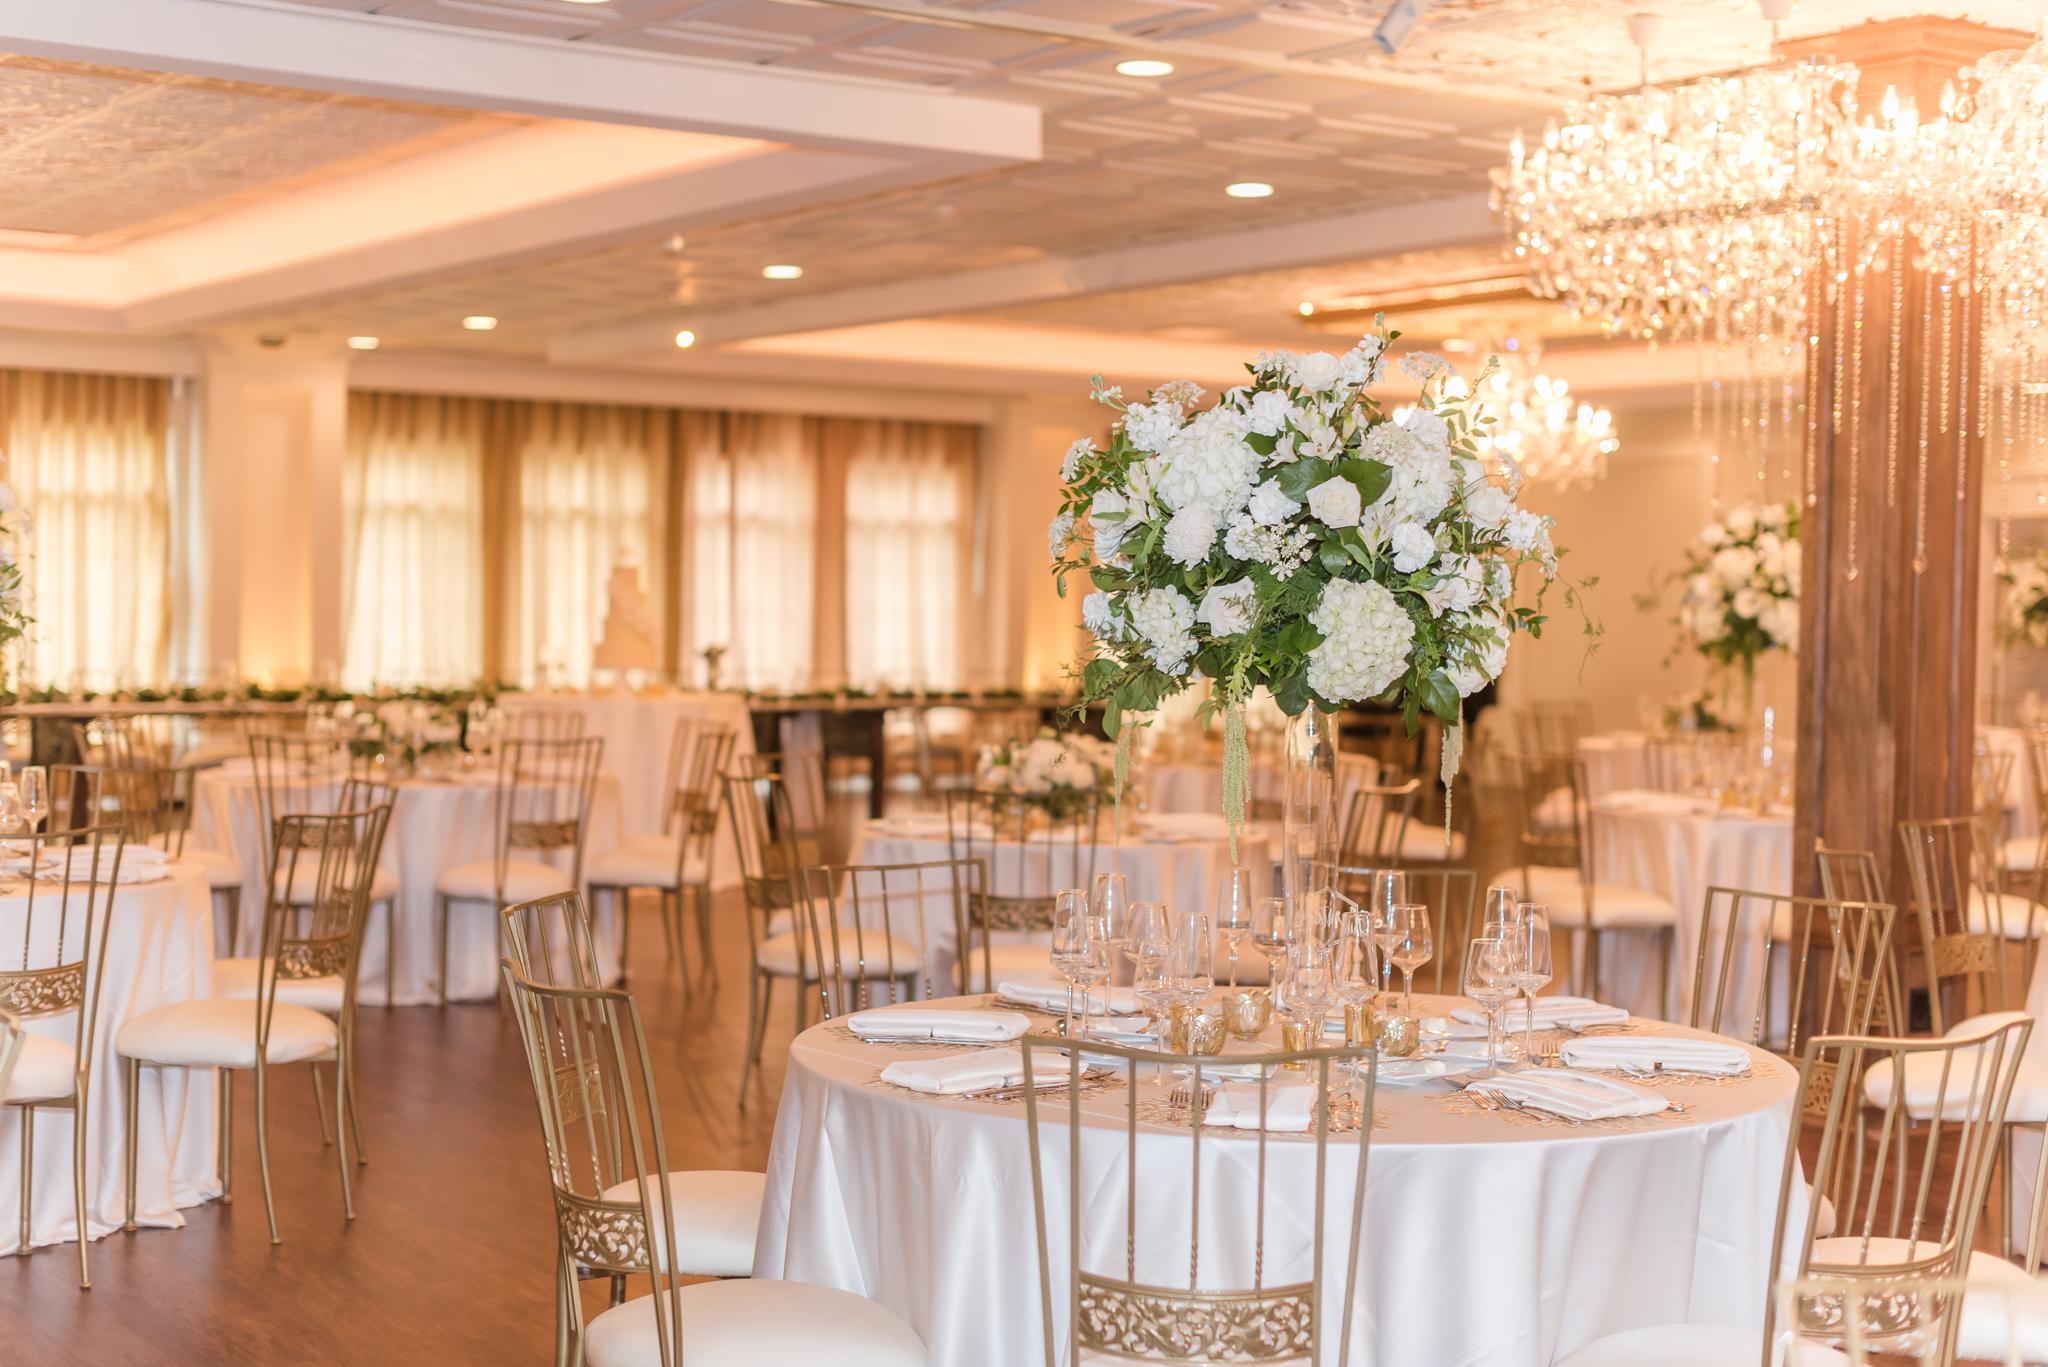 Black Iris Estate Wedding Elegant White with Greenery Luxury High End Flowers-22.jpg